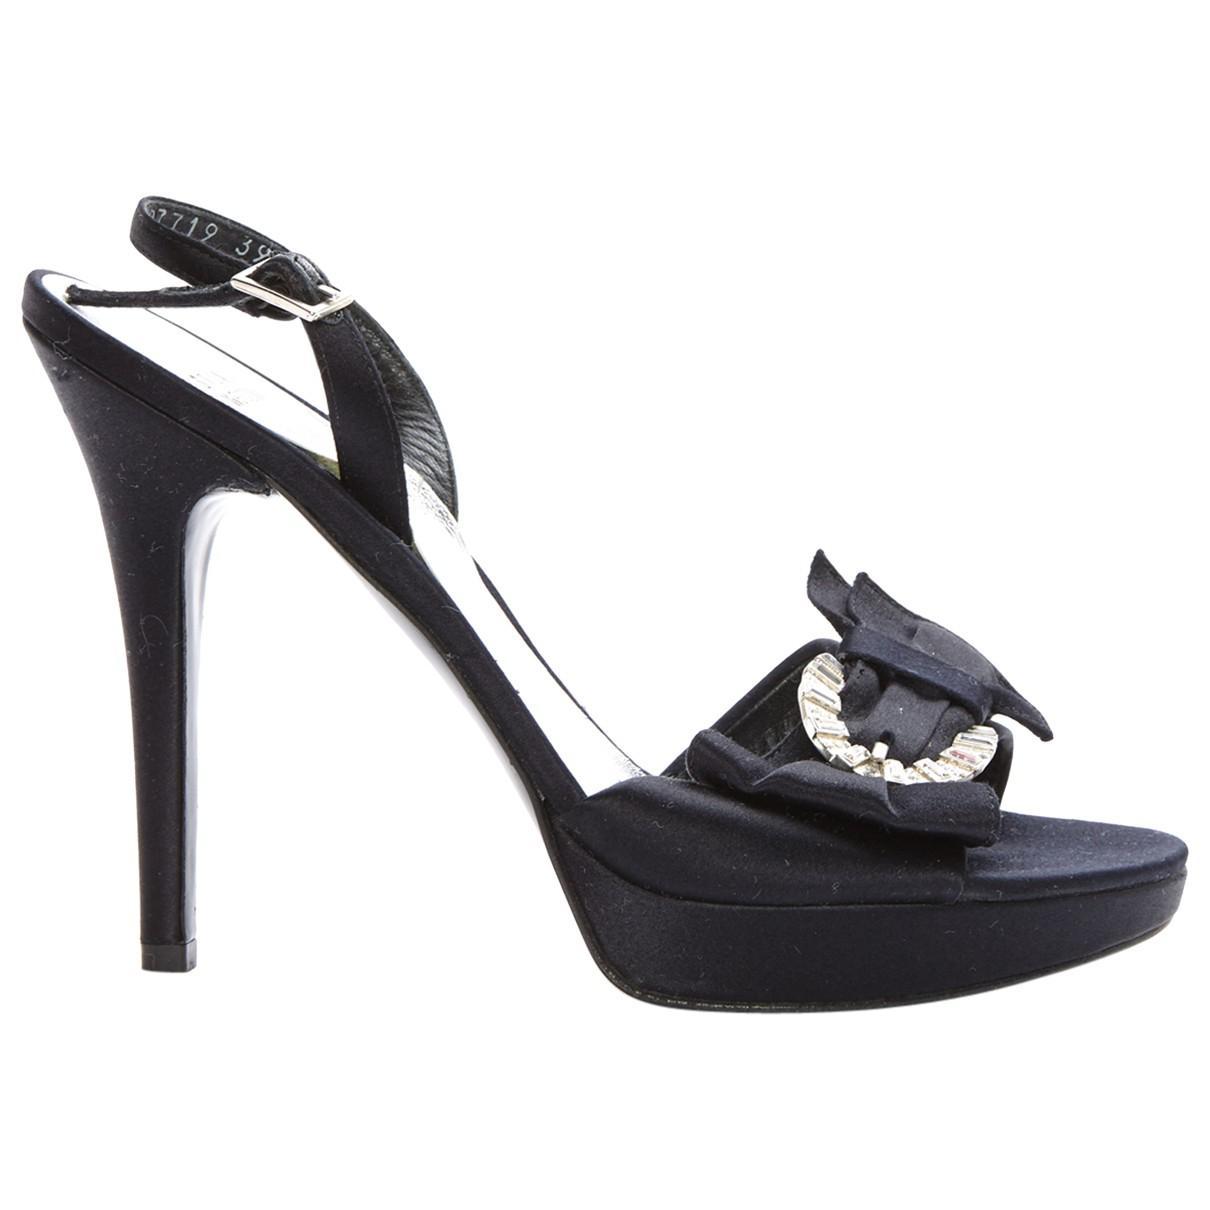 Stuart Weitzman Cloth Sandals Low Cost fw0U0Ww9